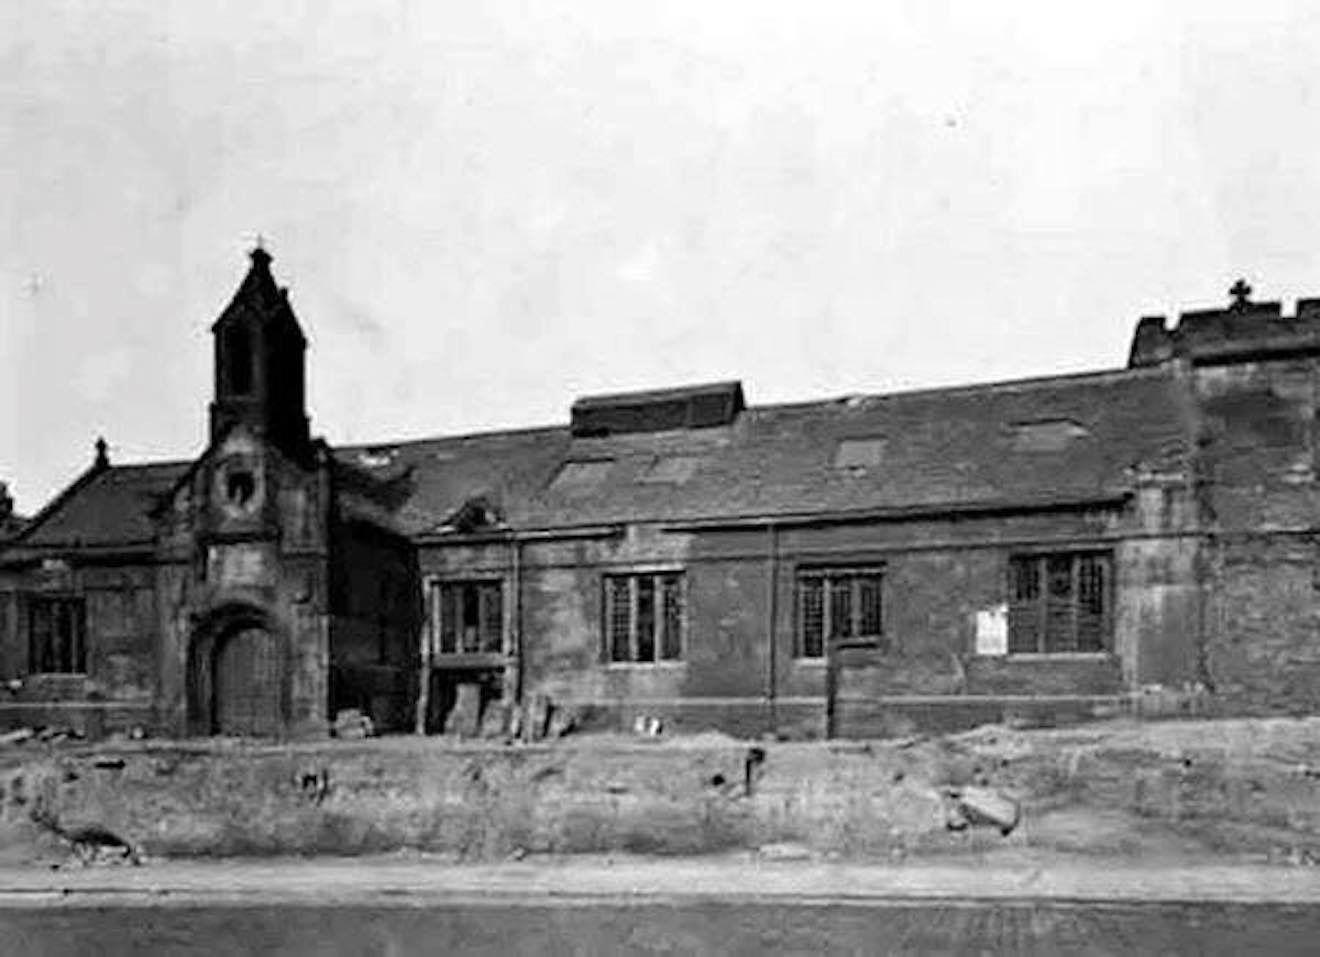 Leeds Boys Grammar School North Street Demolished In 1900 Leeds City Leeds Grammar School